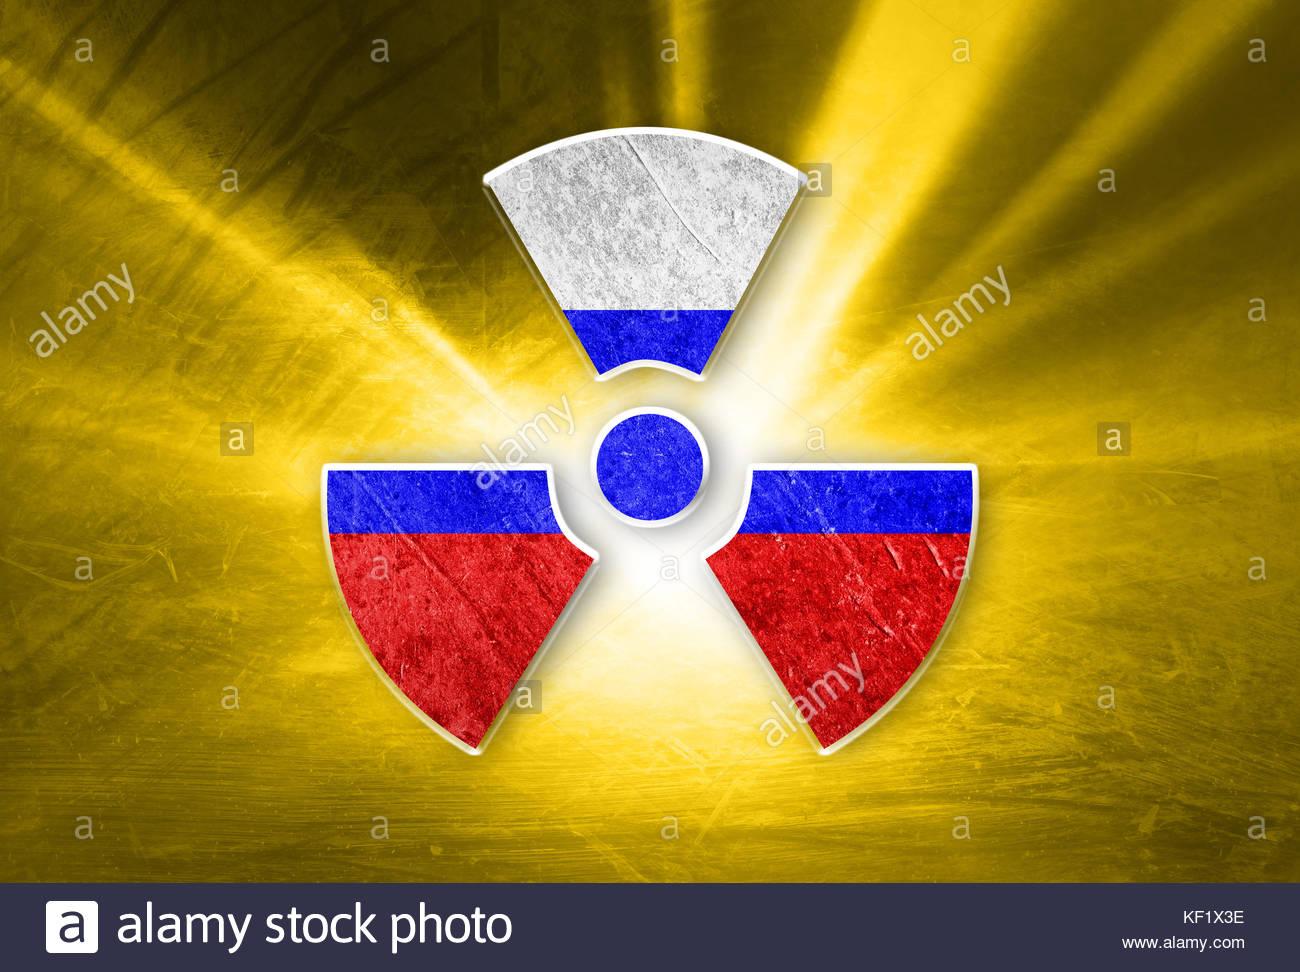 Conceptual shiny radioactive symbol with painted russian flag on conceptual shiny radioactive symbol with painted russian flag on the grunge yellow colored illustration background buycottarizona